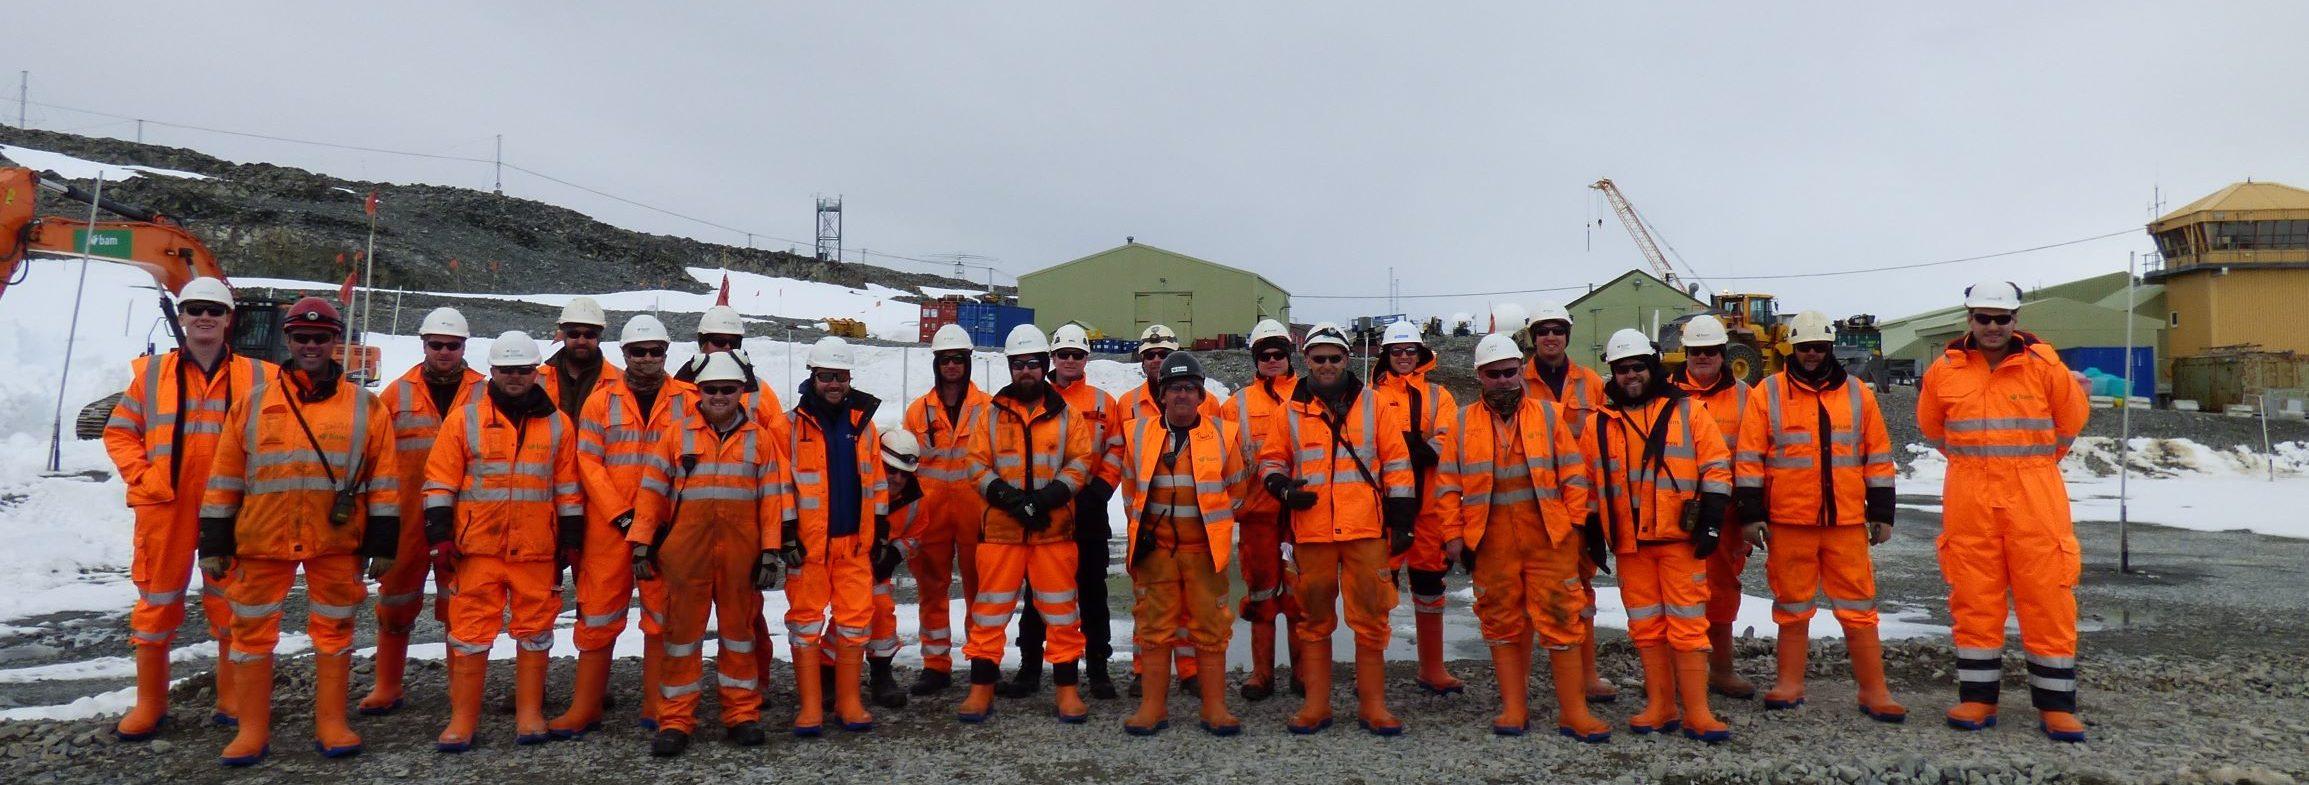 Photo of Discovery Building Construction Team Season 2Team